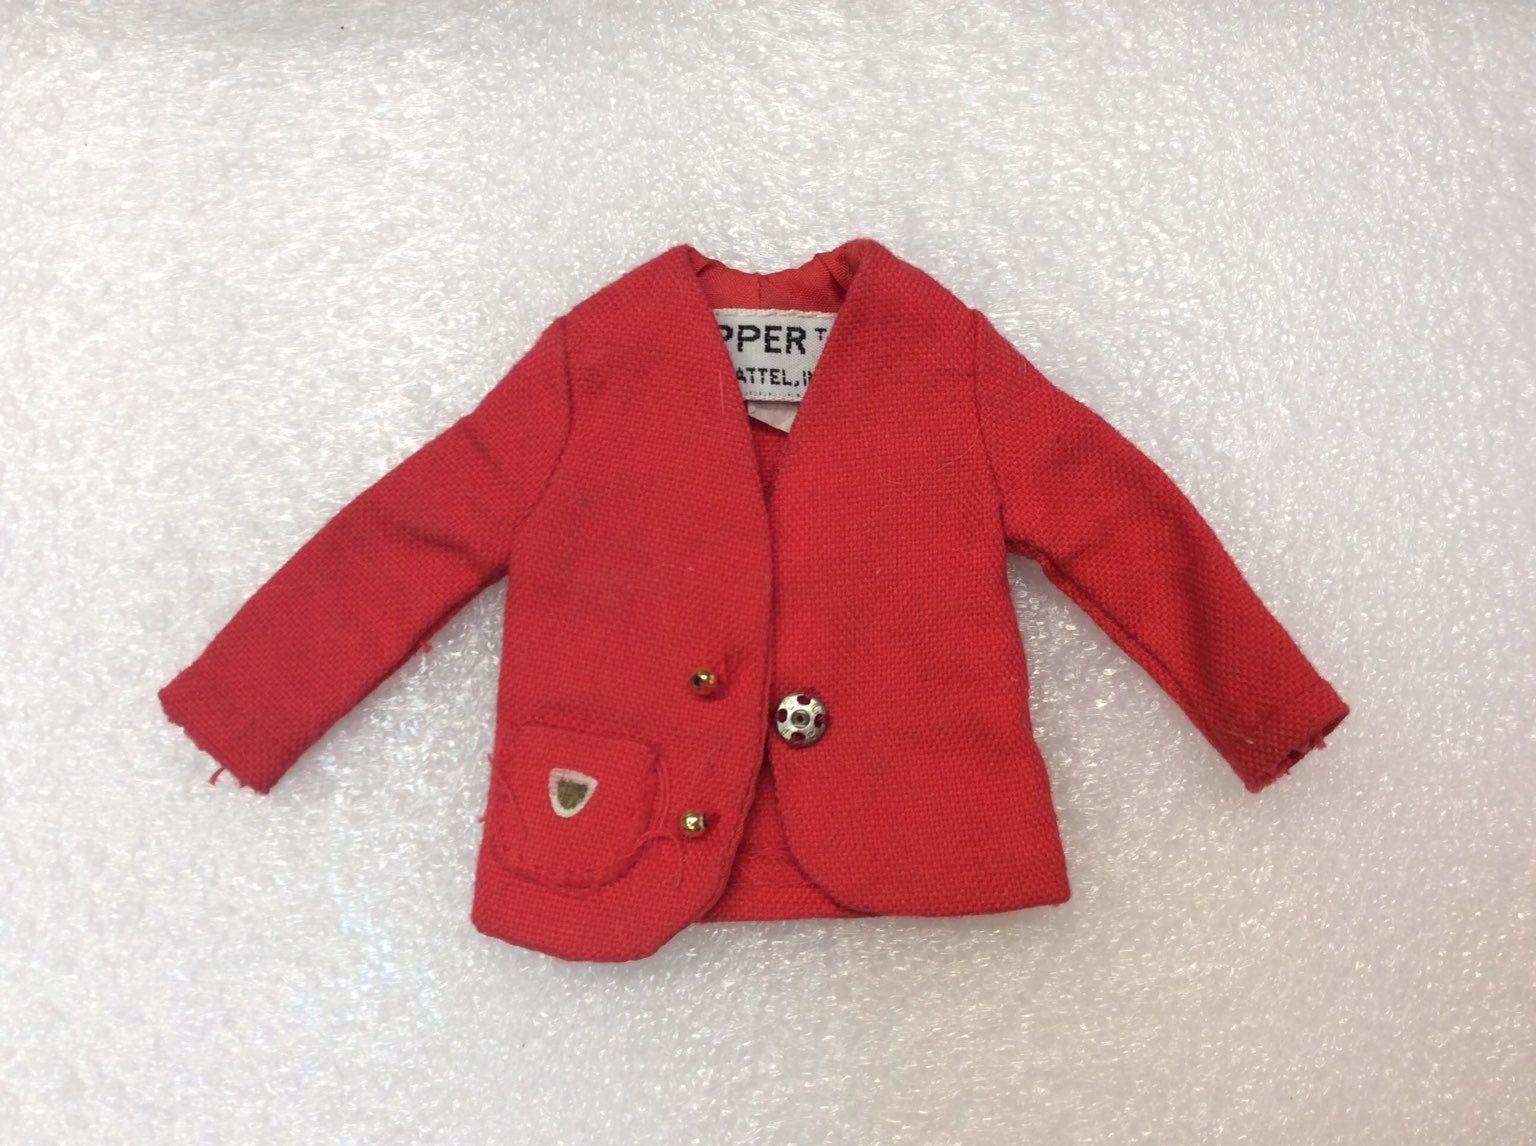 Vintage Skipper doll red jacket 1963 on Mercari